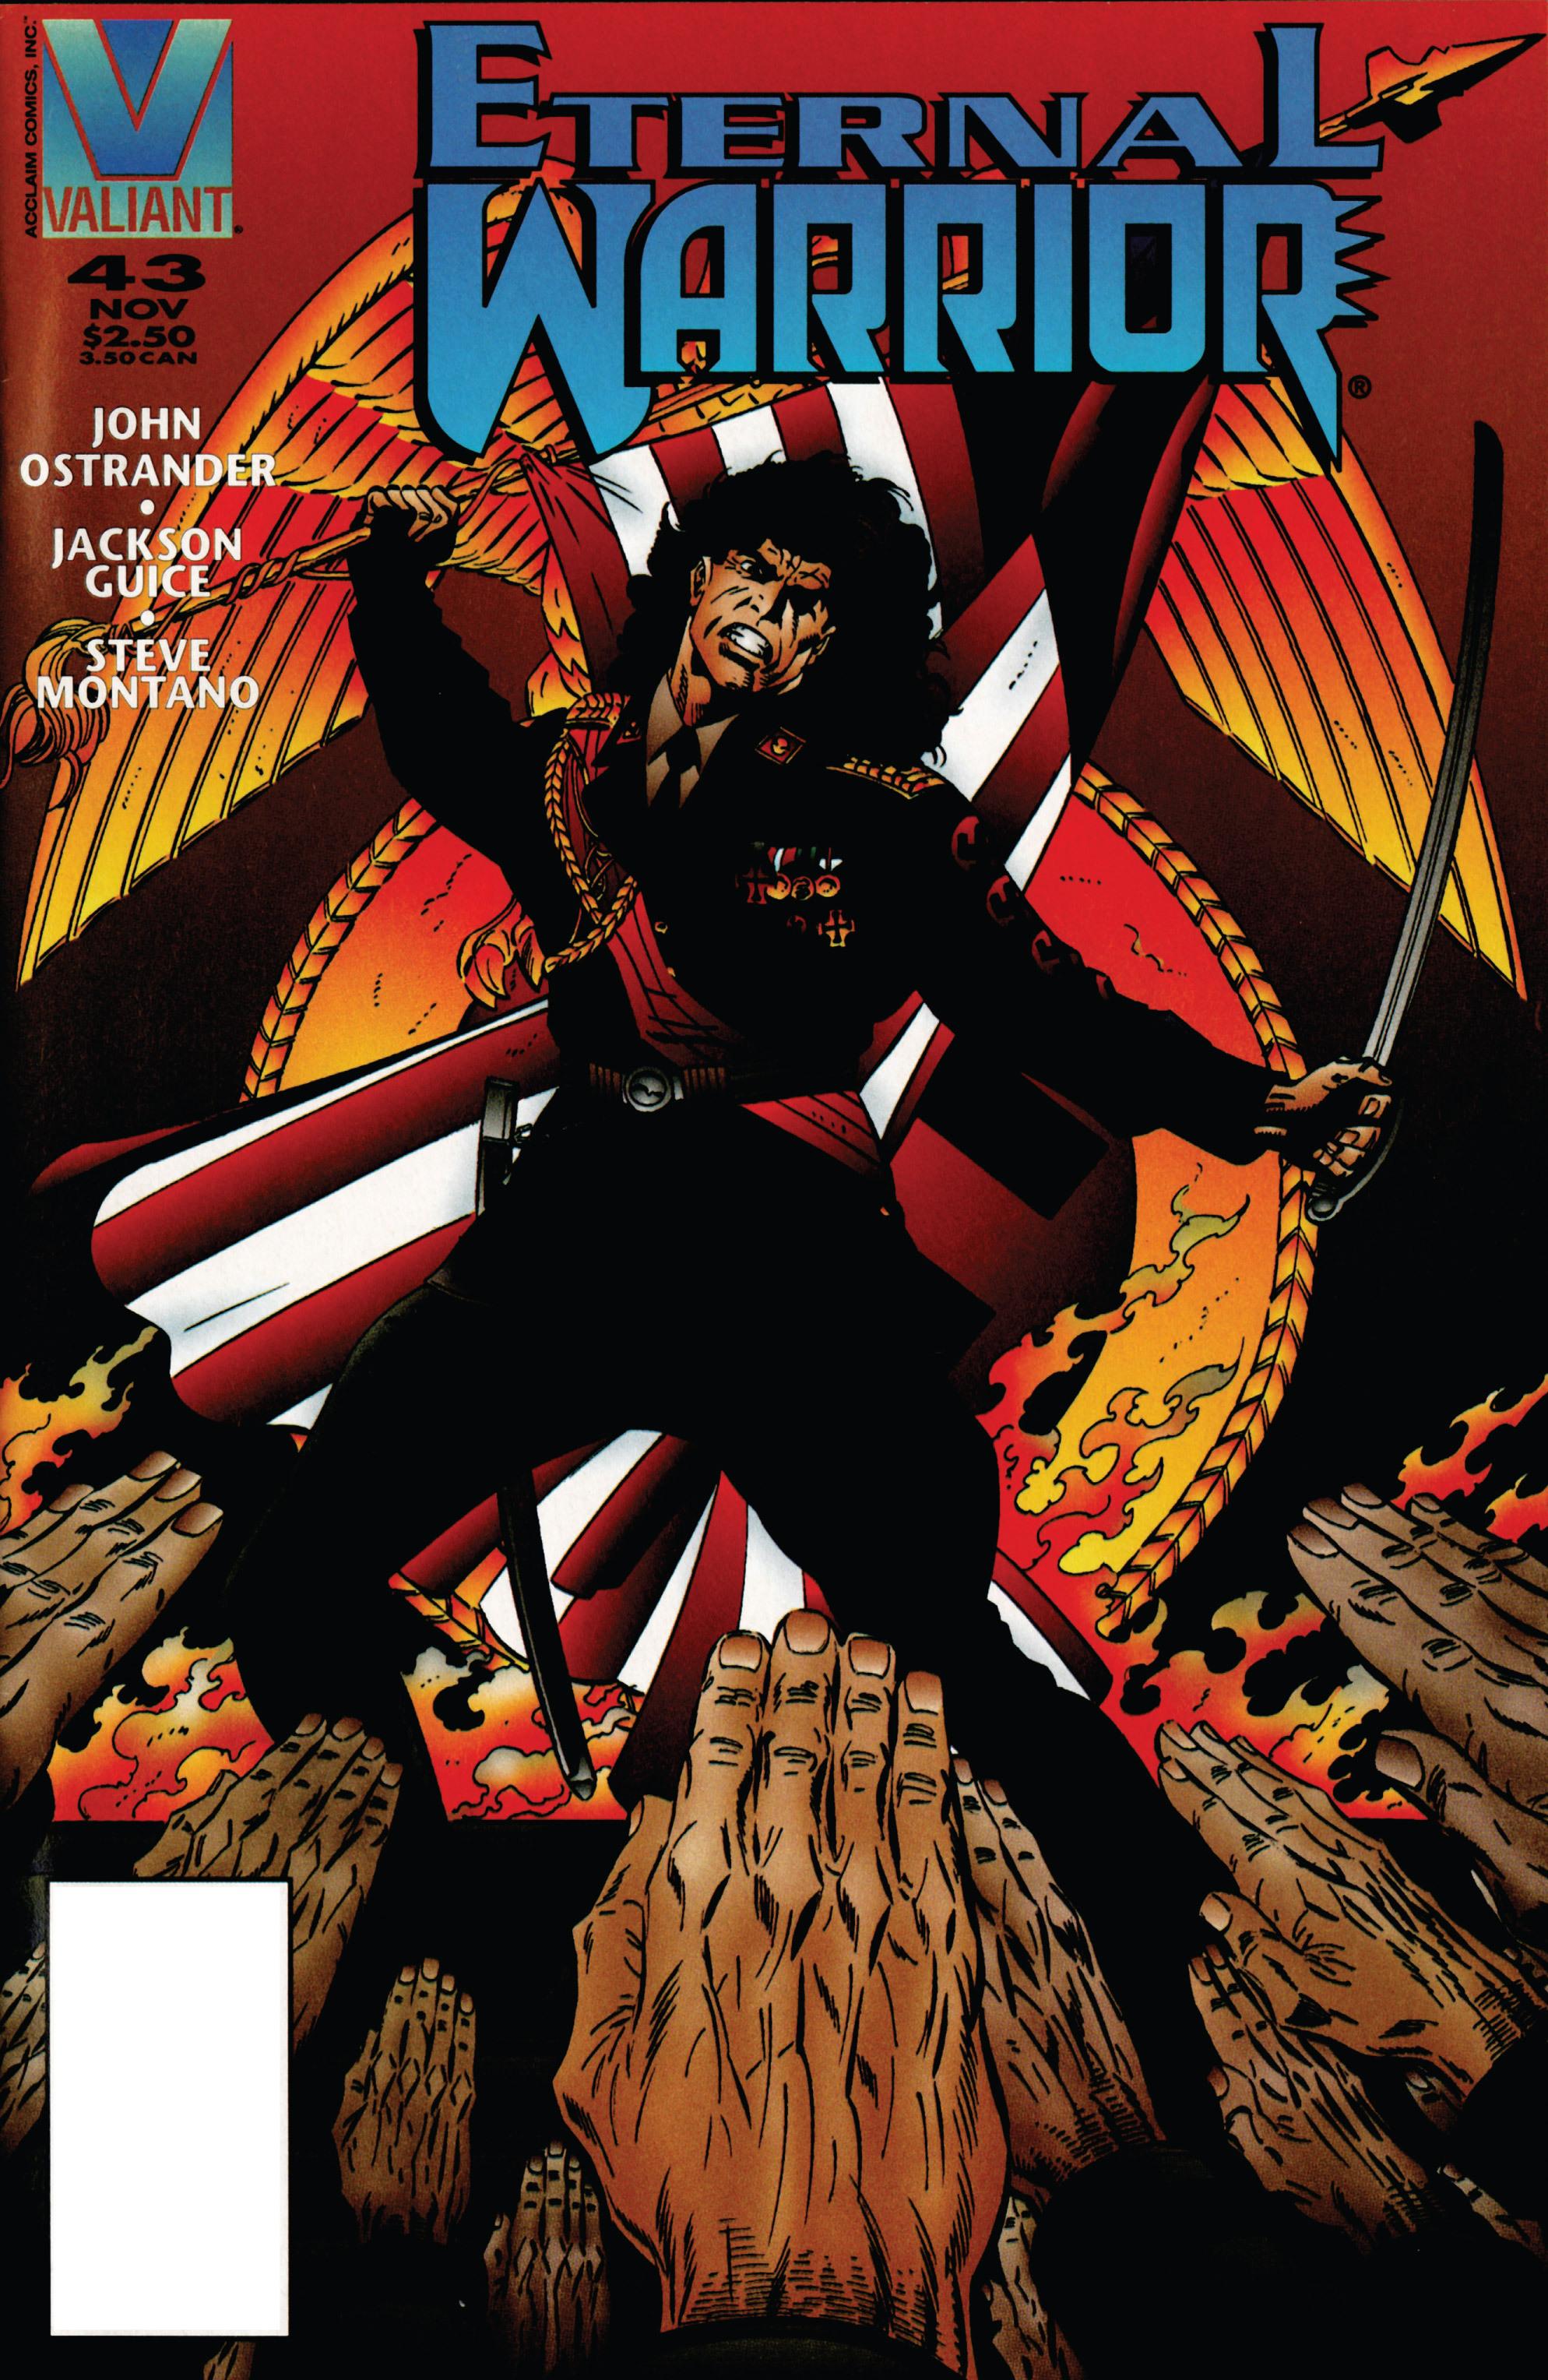 Read online Eternal Warrior (1992) comic -  Issue #43 - 1